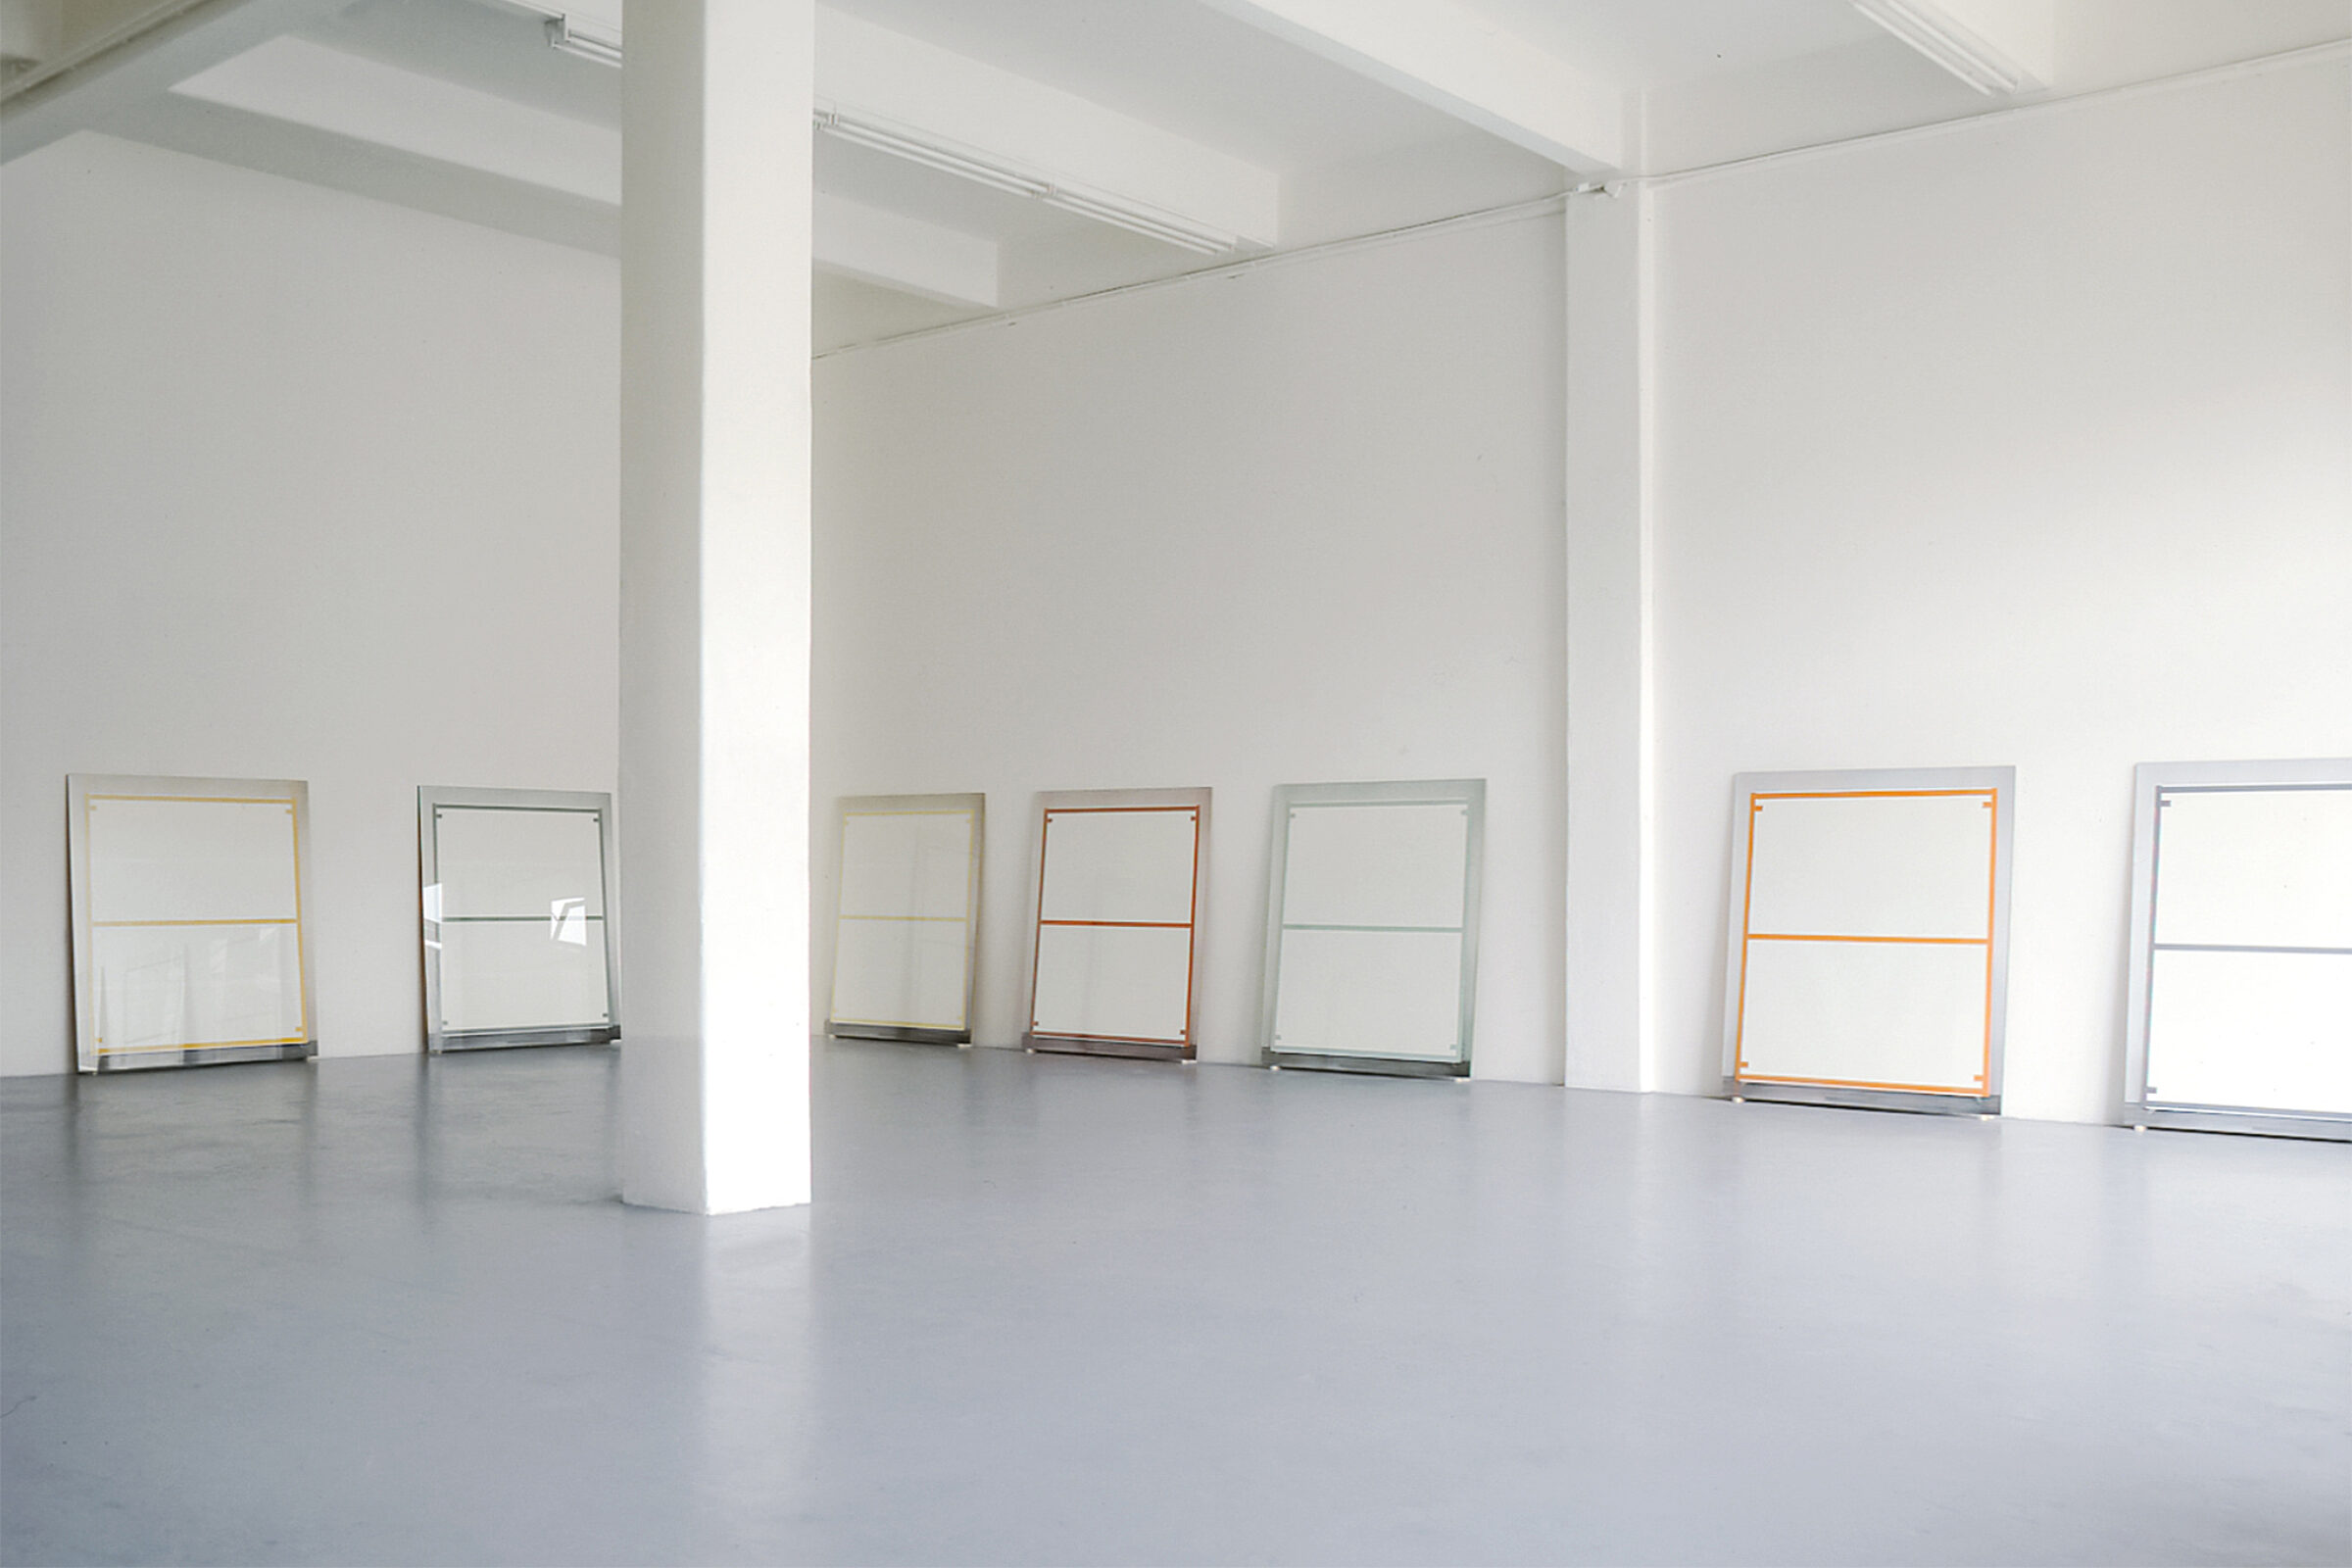 Alan-Uglow-Galerie-Onrust-works_50